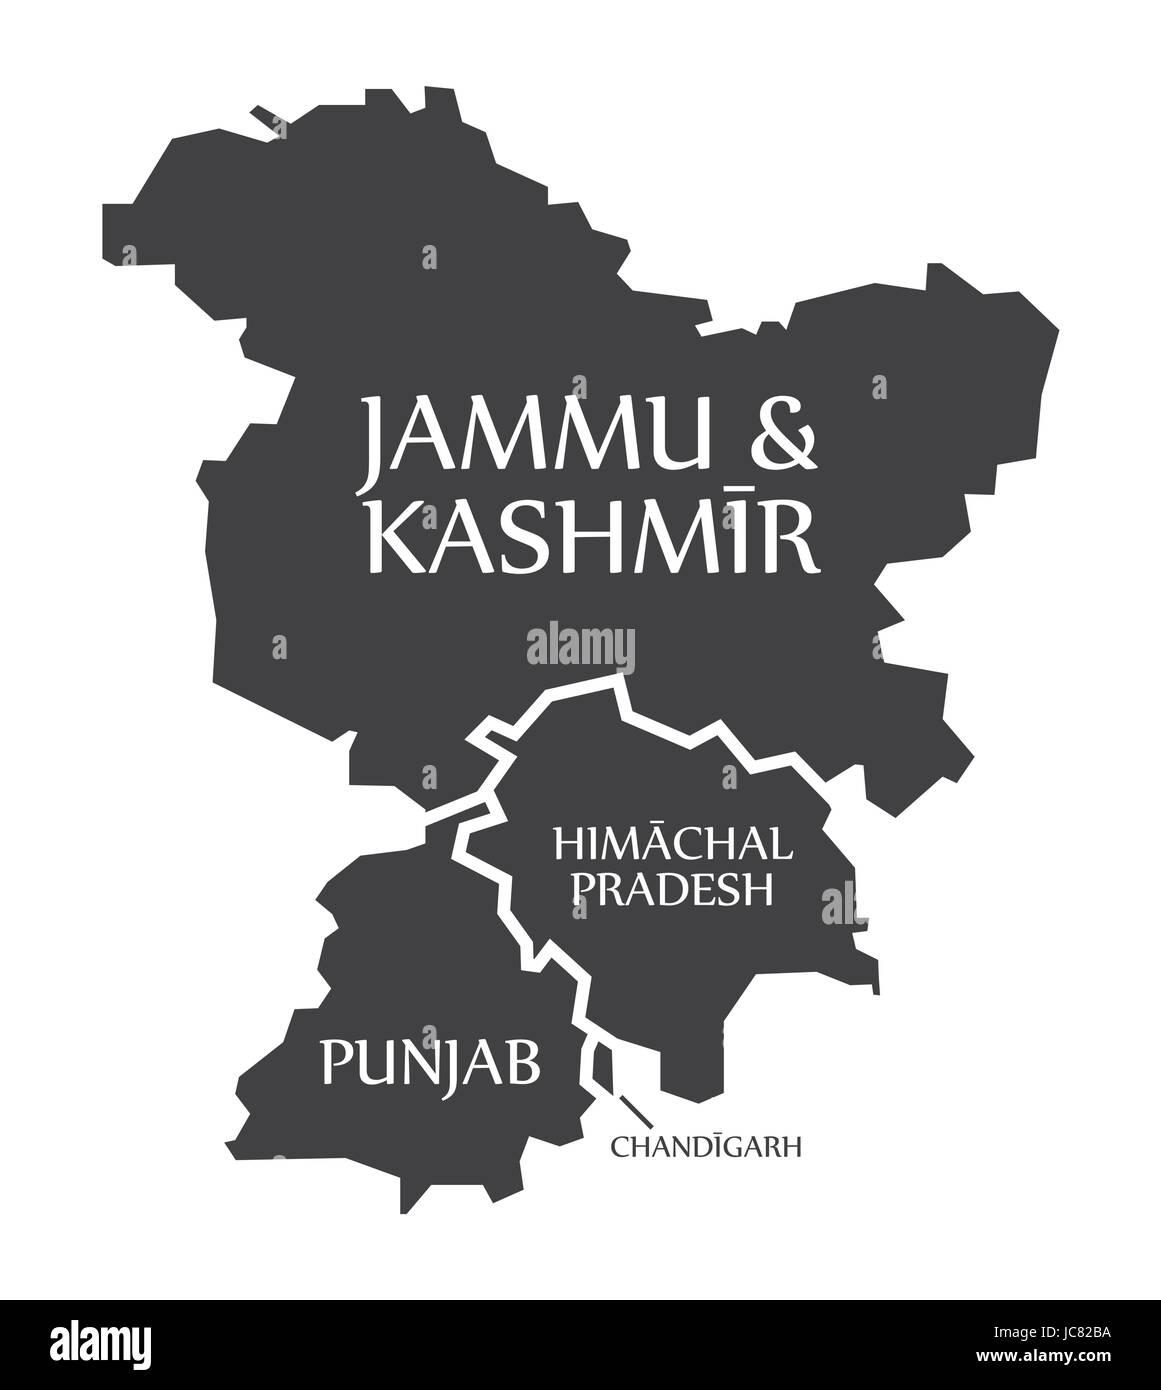 Jammu and Kashmir - Himachal Pradesh - Punjab - Chandigarh Map Illustration of Indian states - Stock Vector